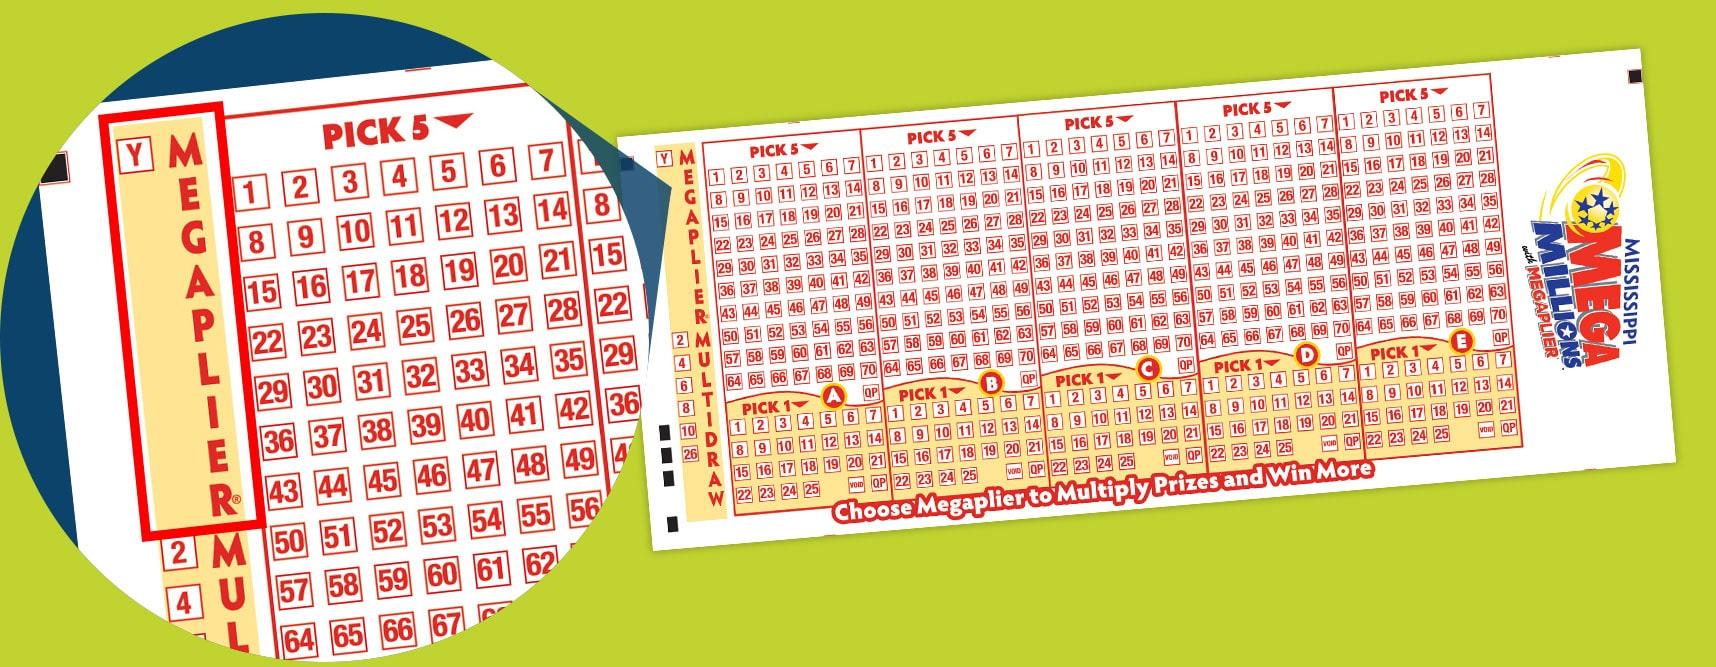 Mega Millions Mississippi Lottery